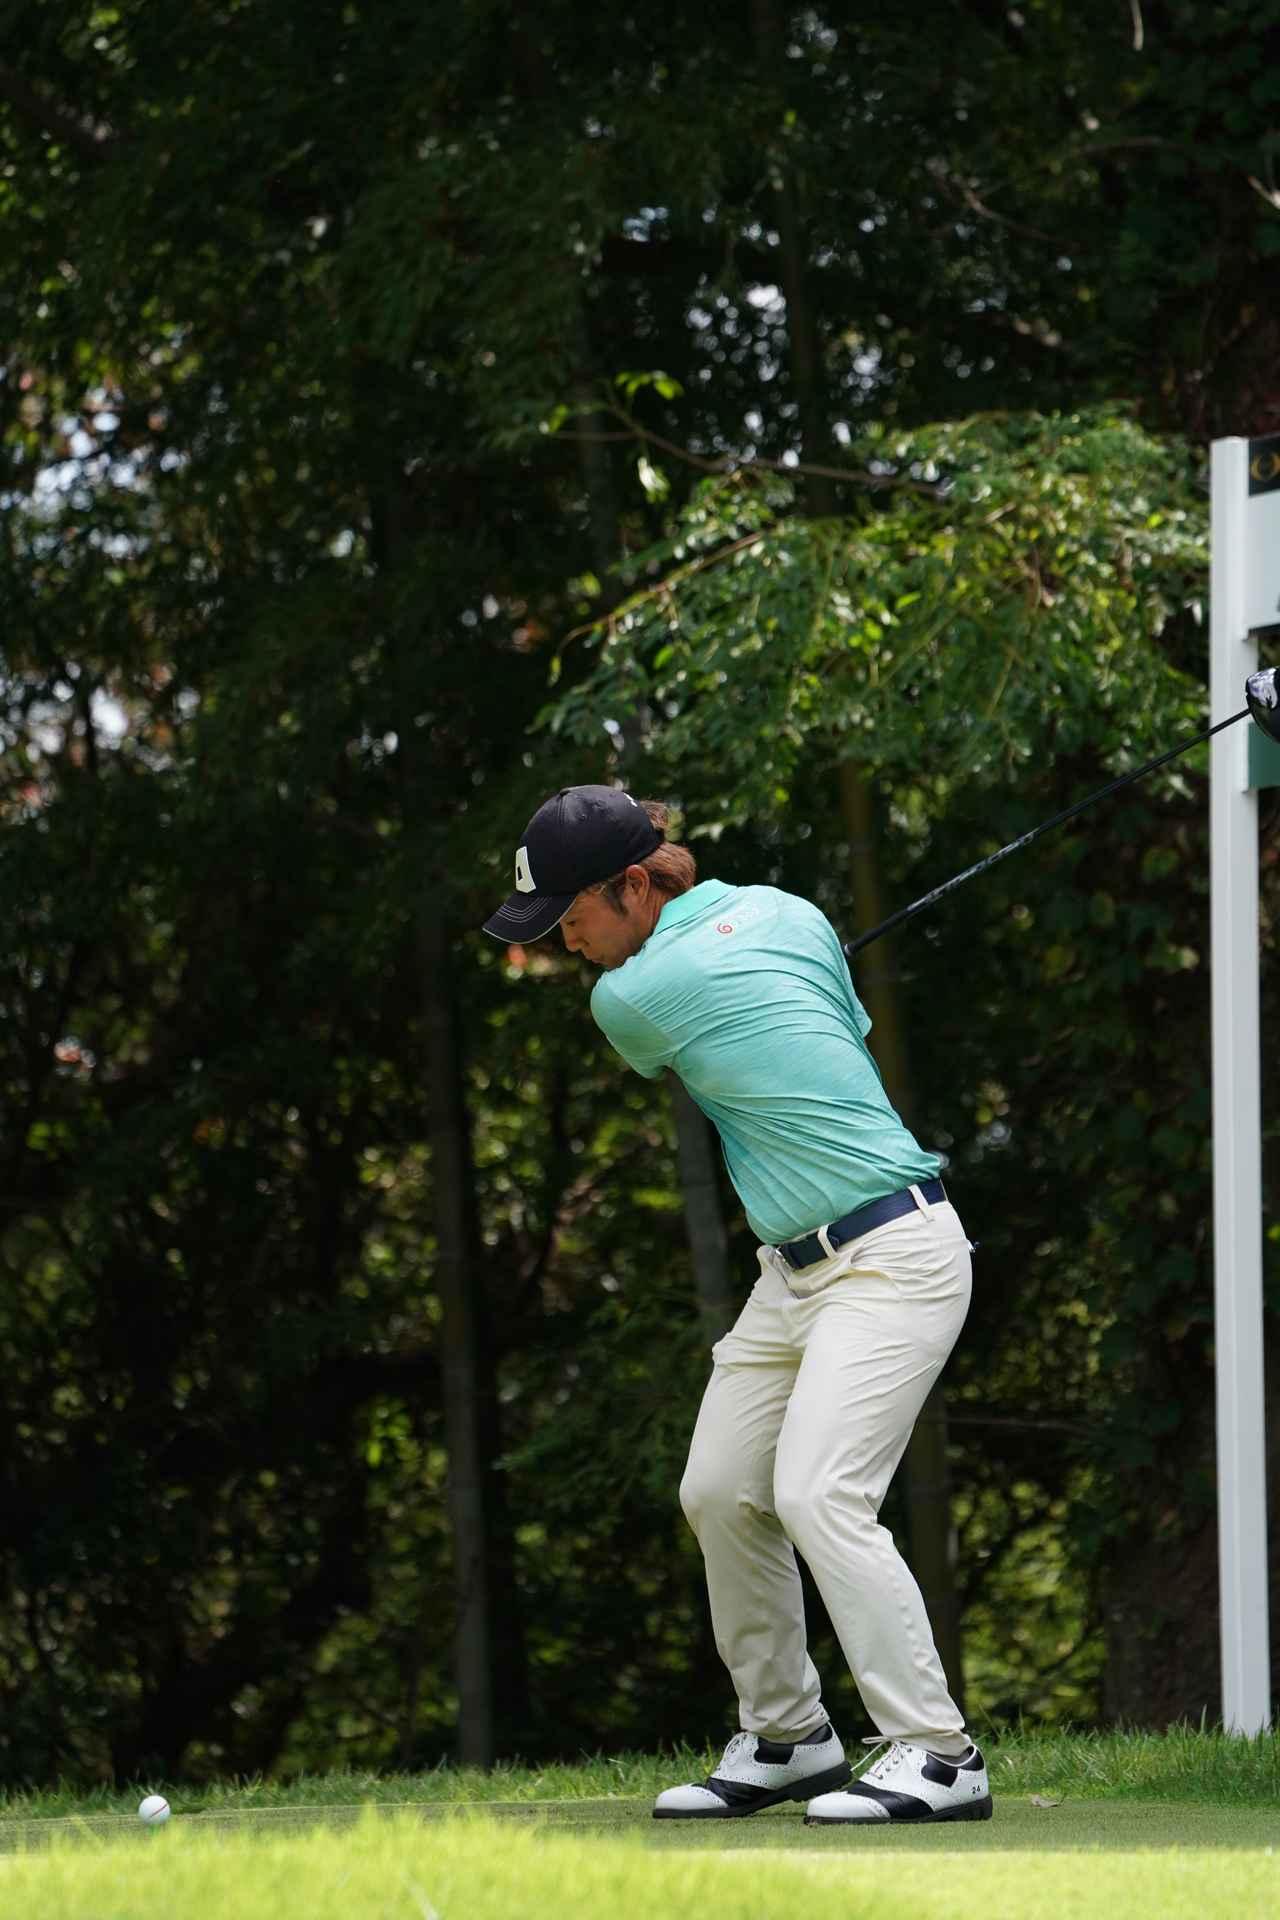 Images : 6番目の画像 - 浅地洋佑のドライバー連続写真 - みんなのゴルフダイジェスト